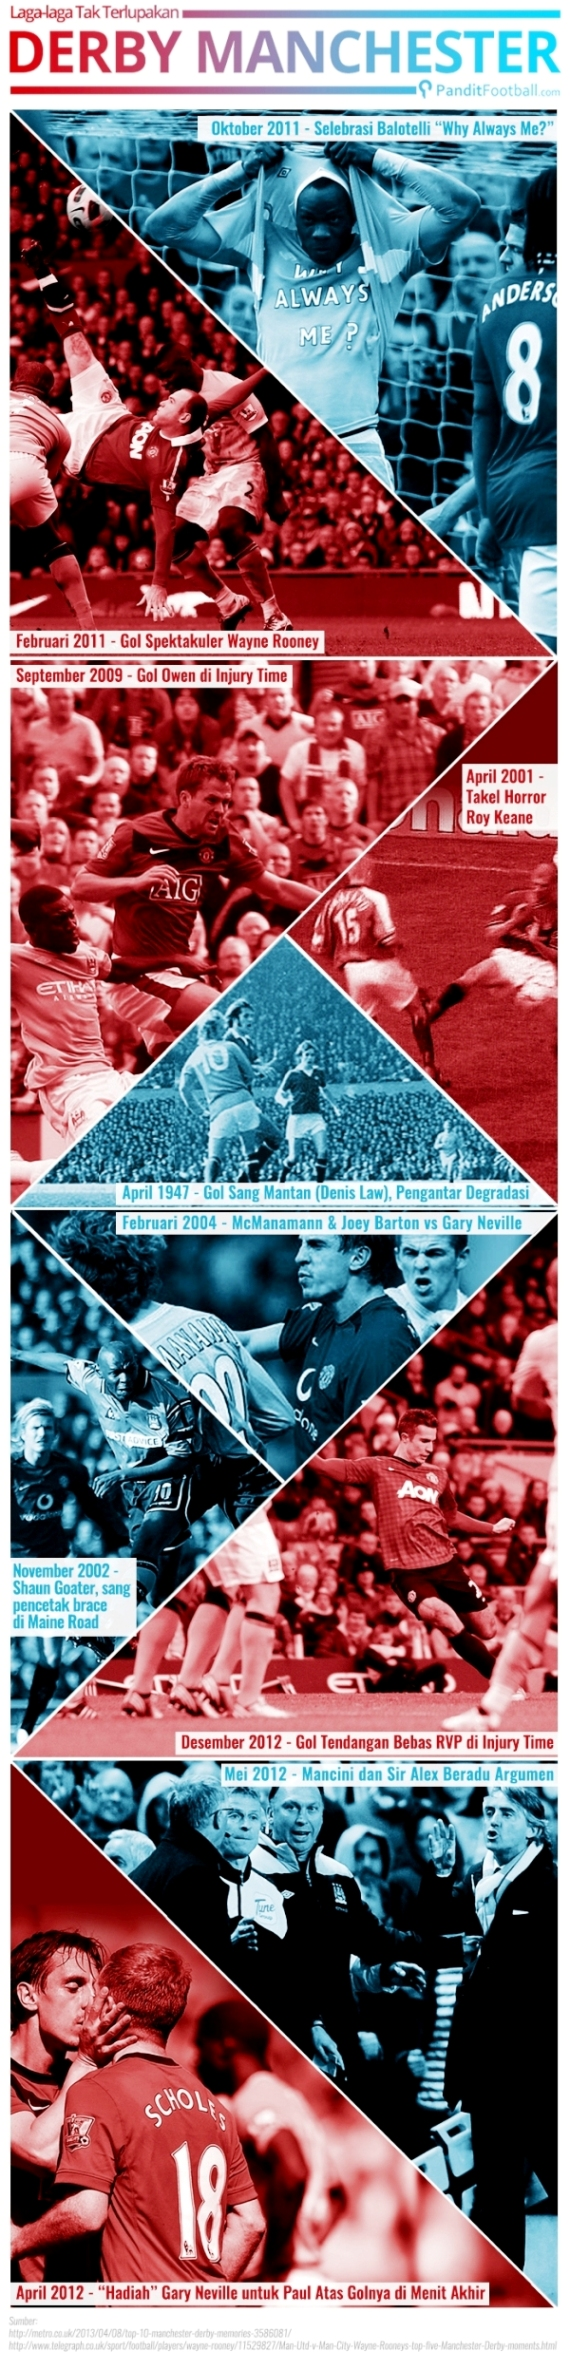 Laga-laga tak terlupakan Derby Manchester copy